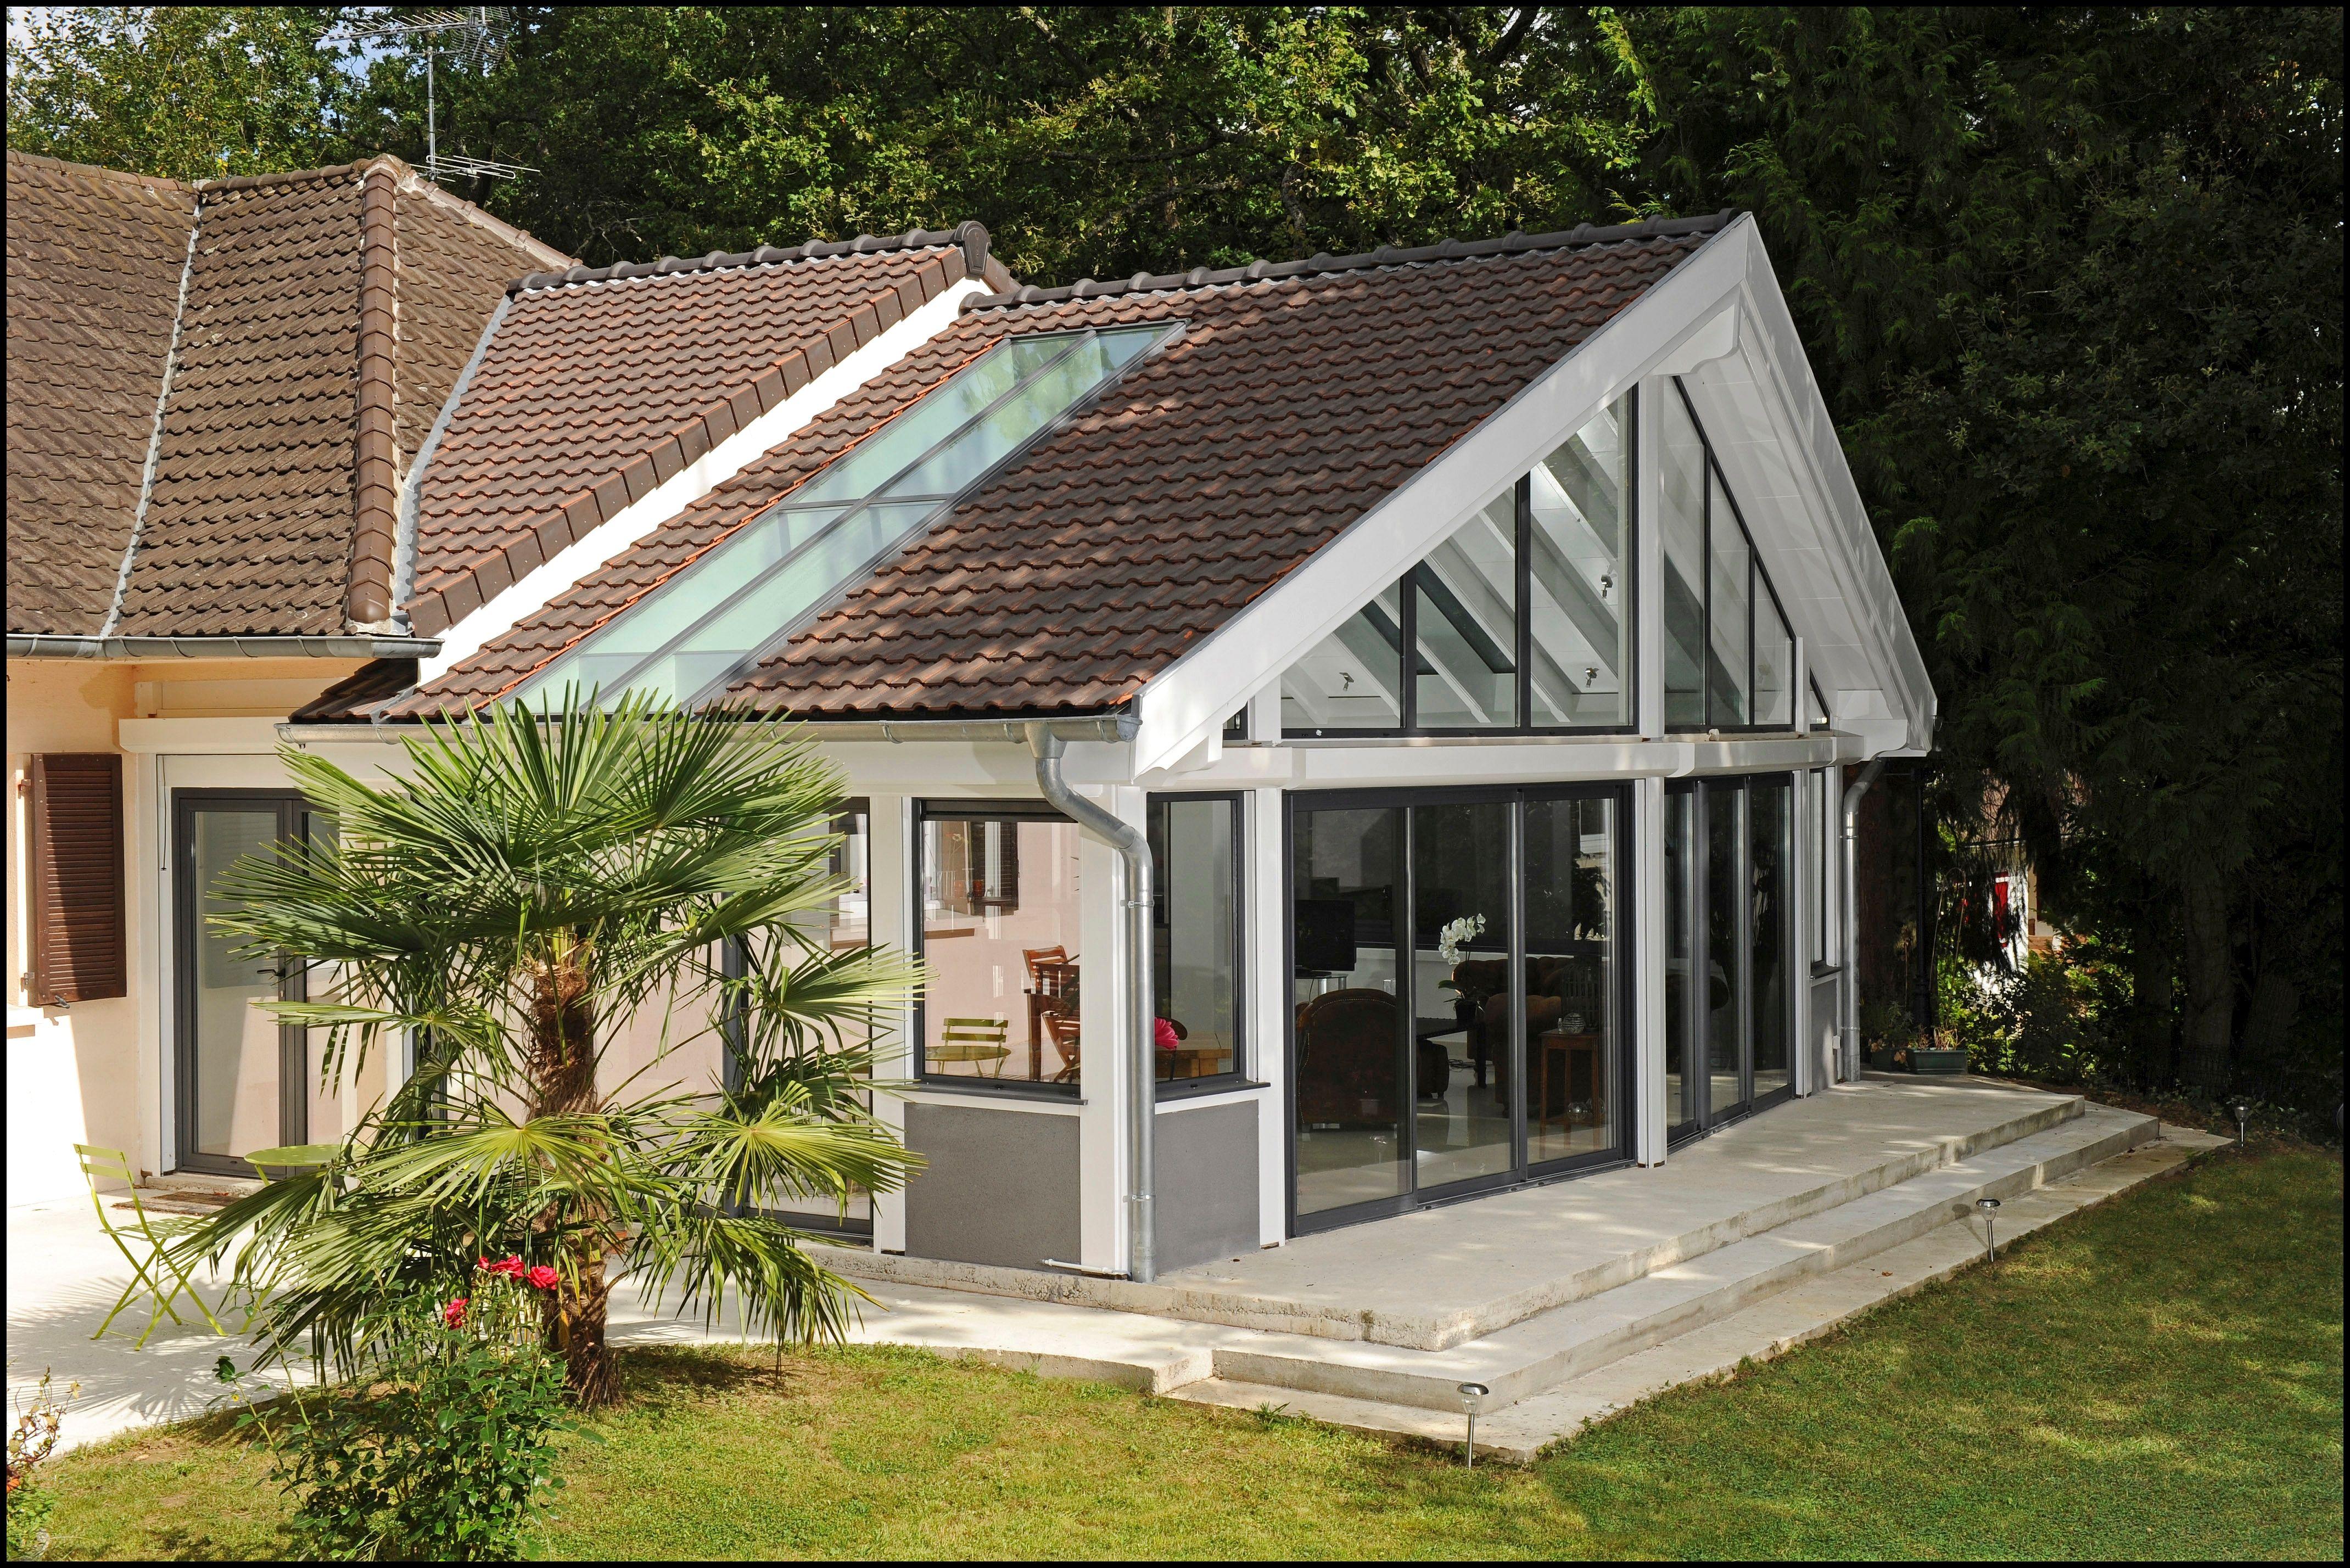 V randa extension int gr e la maison avec une belle toiture 2 pans par vie v randa v randa - Maison avec veranda integree ...